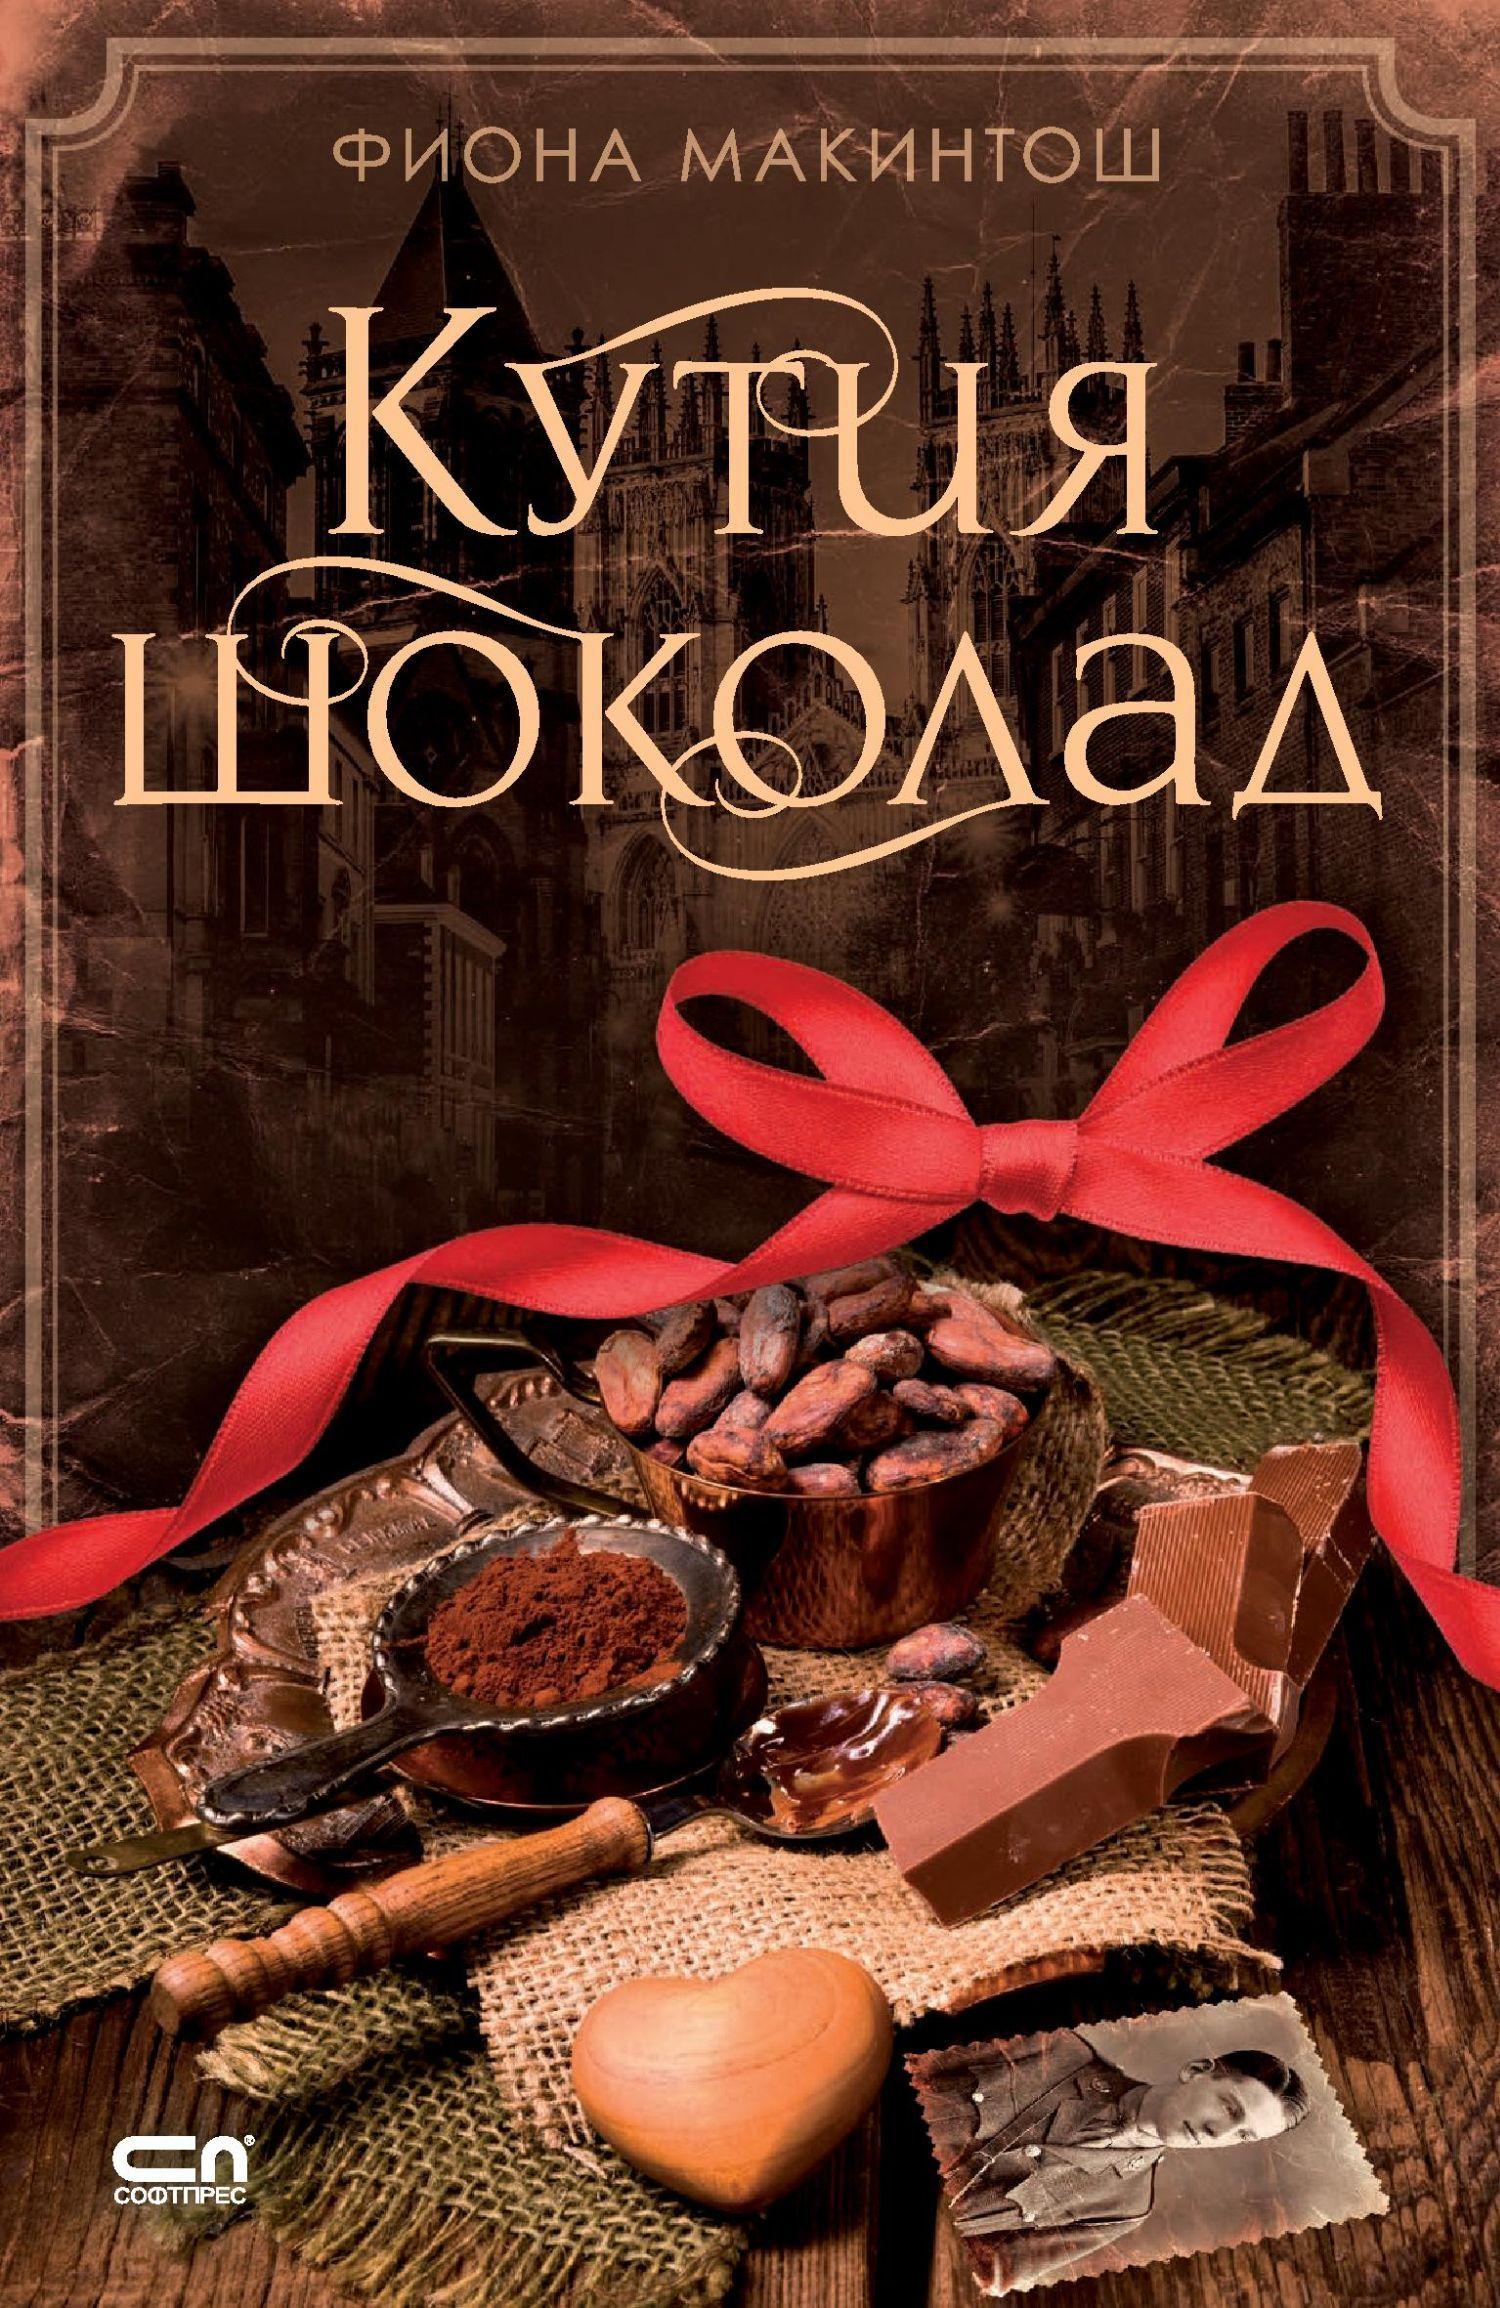 kutija-shokolad - 1